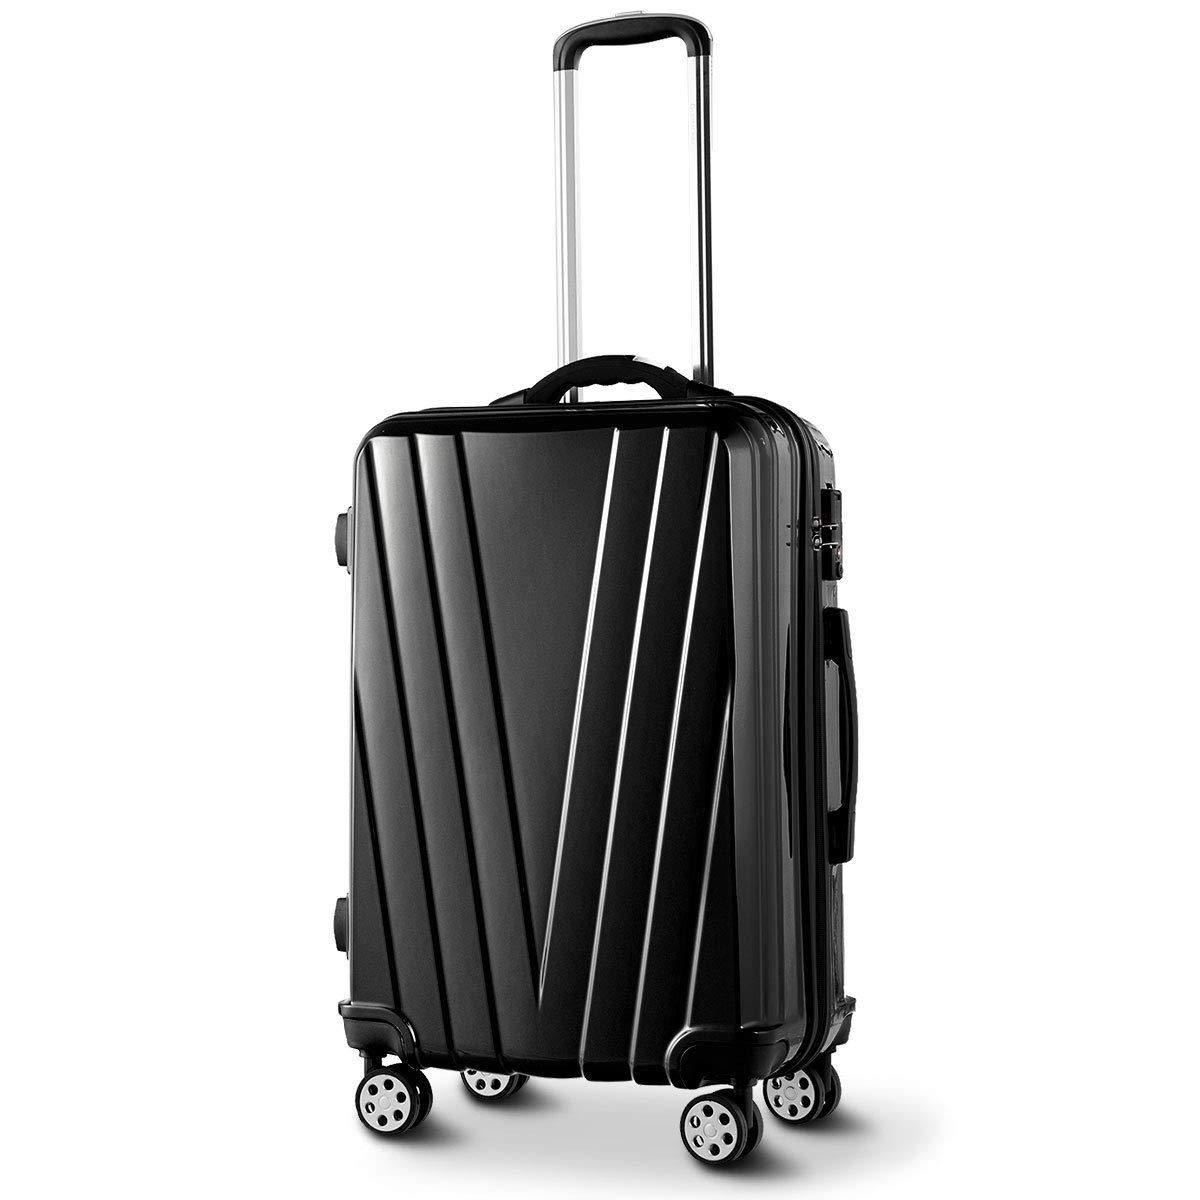 LHONE 3 pcs Luggage Set 20 2428 inches Carry-On Lightweight Hardshell Spinner Travel Trolley Suitcase with TSA Lock Black